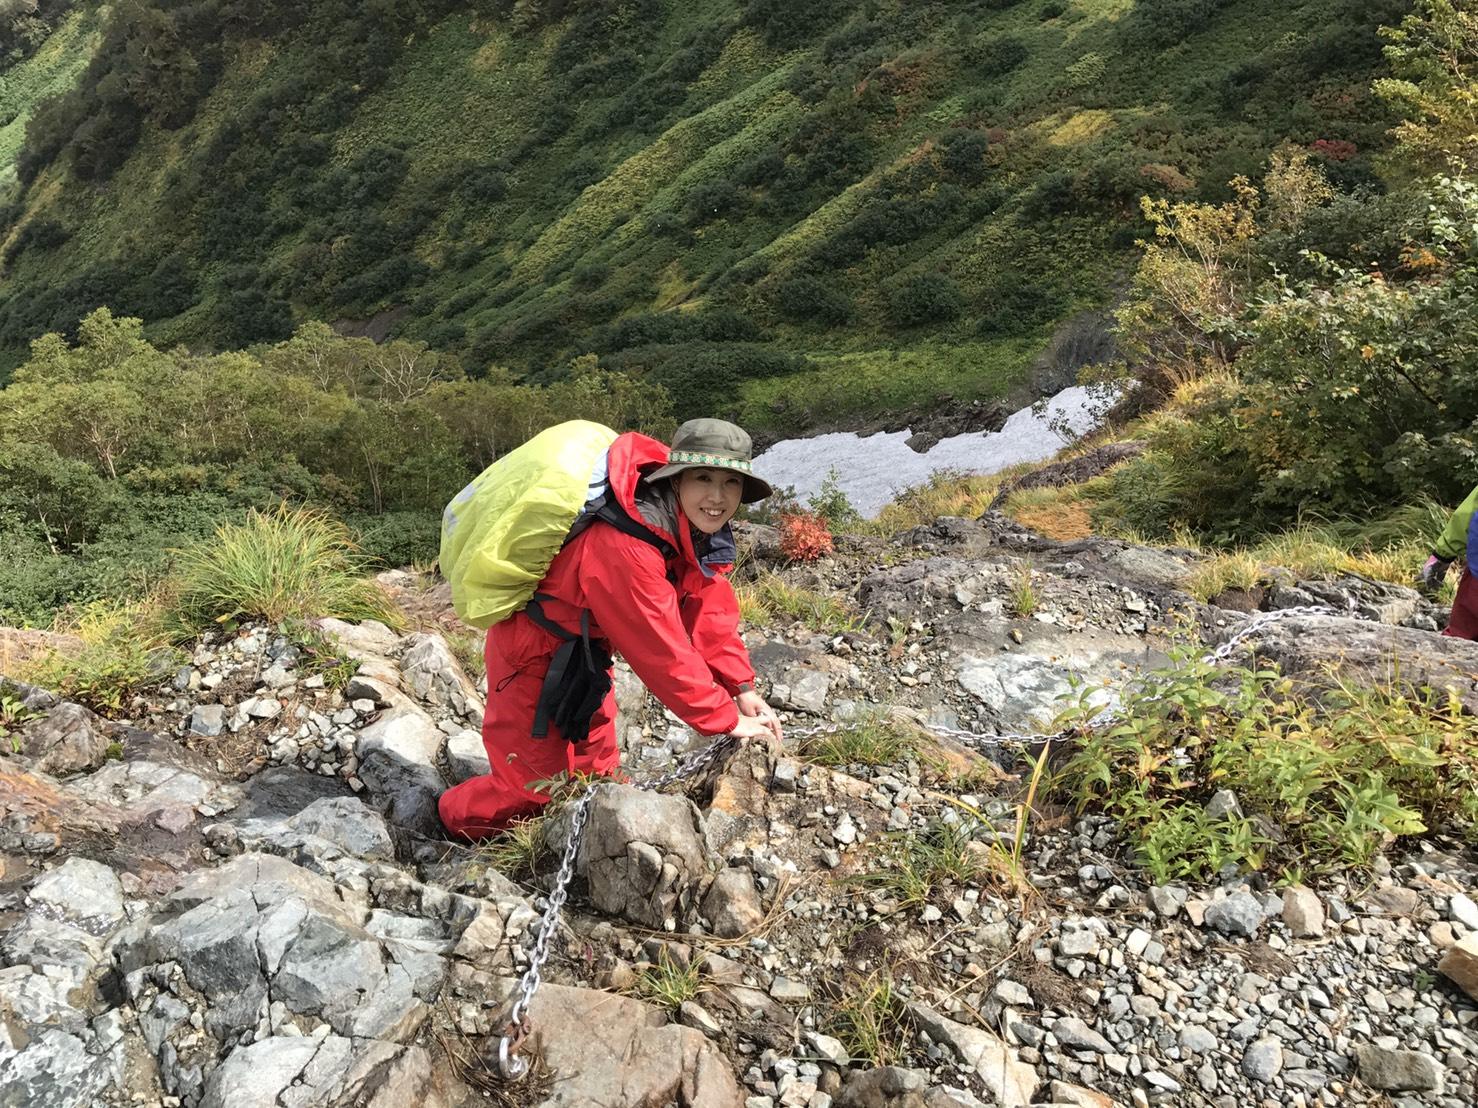 白馬鑓岳温泉小屋に下山中